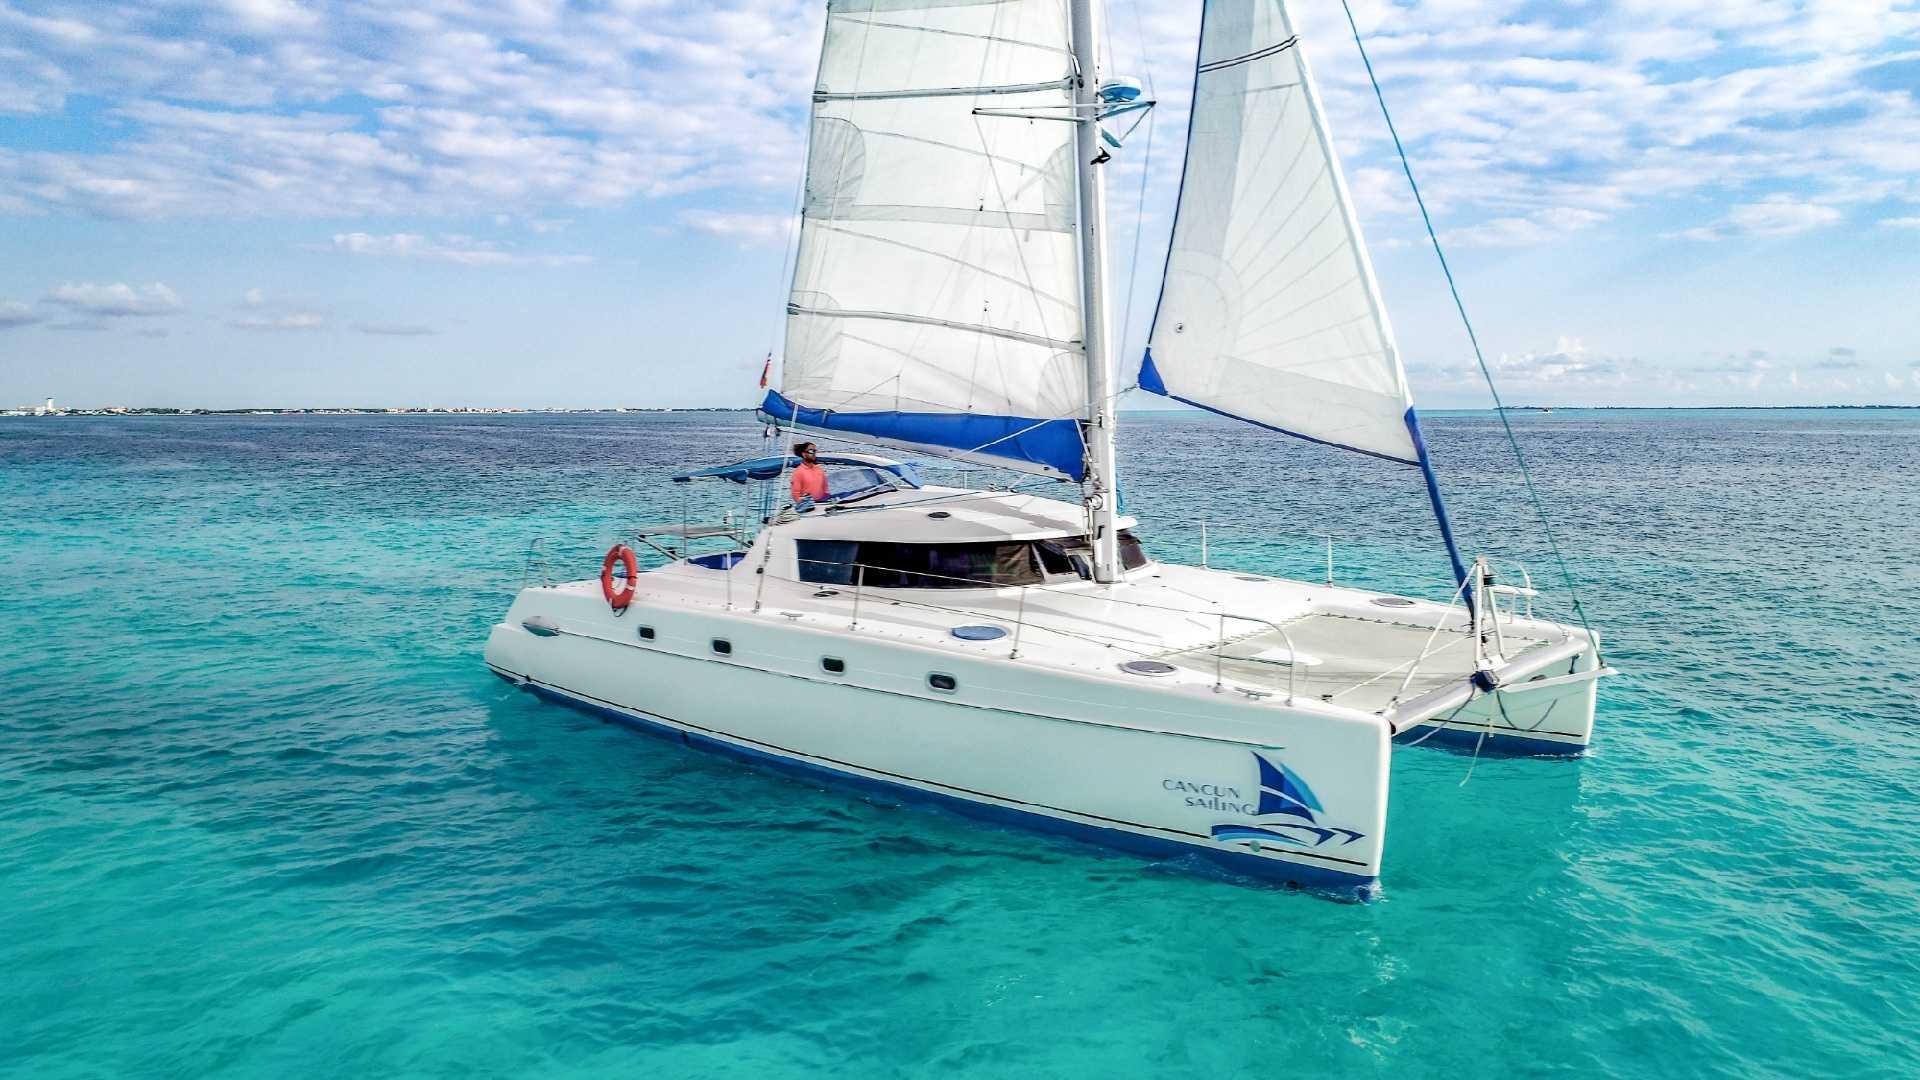 2 - LoRes - 4 Vents - Isla Mujeres Catamaran Tour - Cancun Sailing